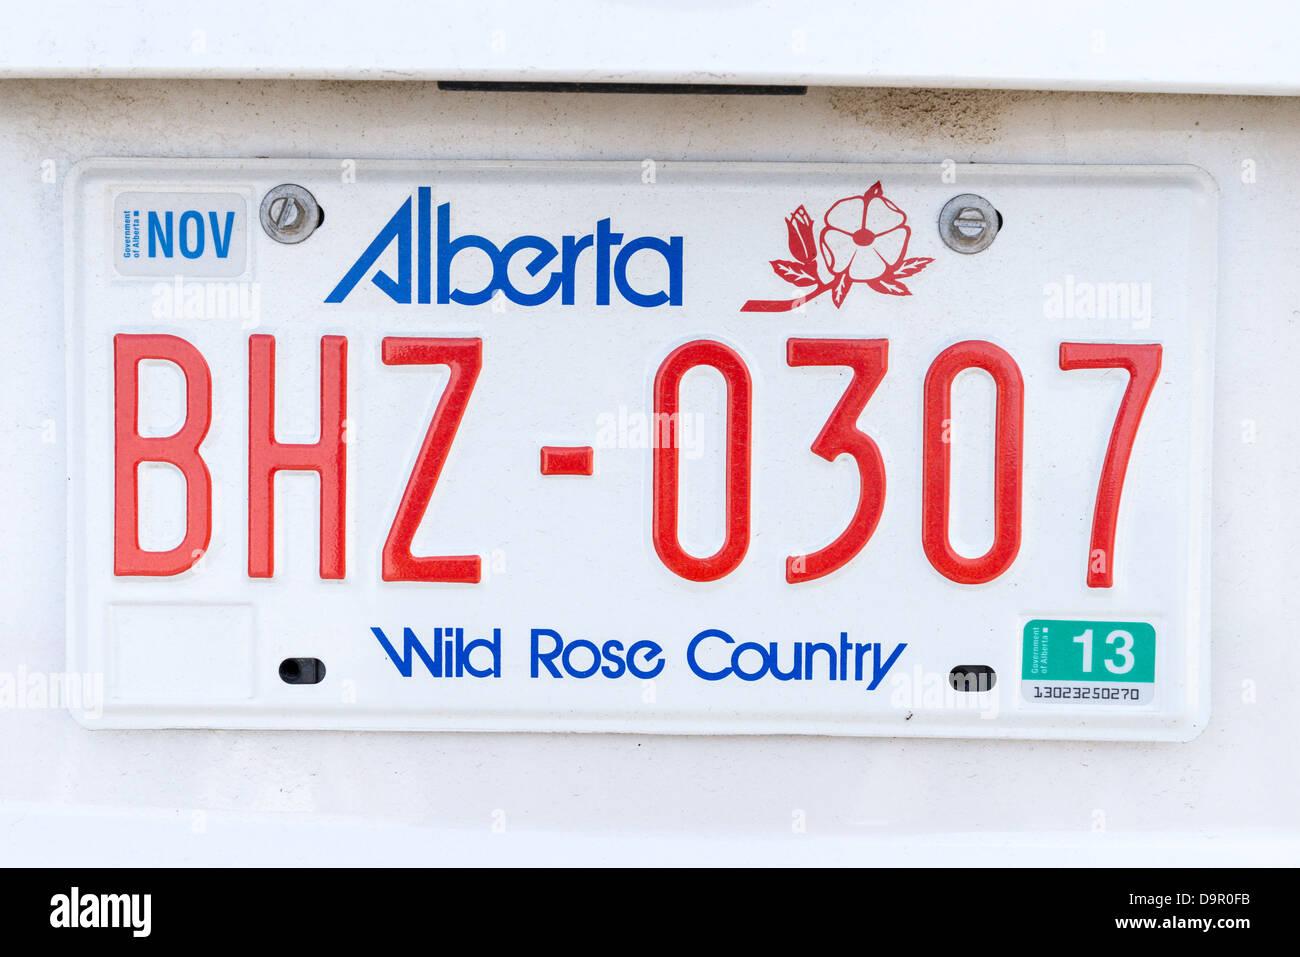 Alberta car license plate BHZ - Stock Image